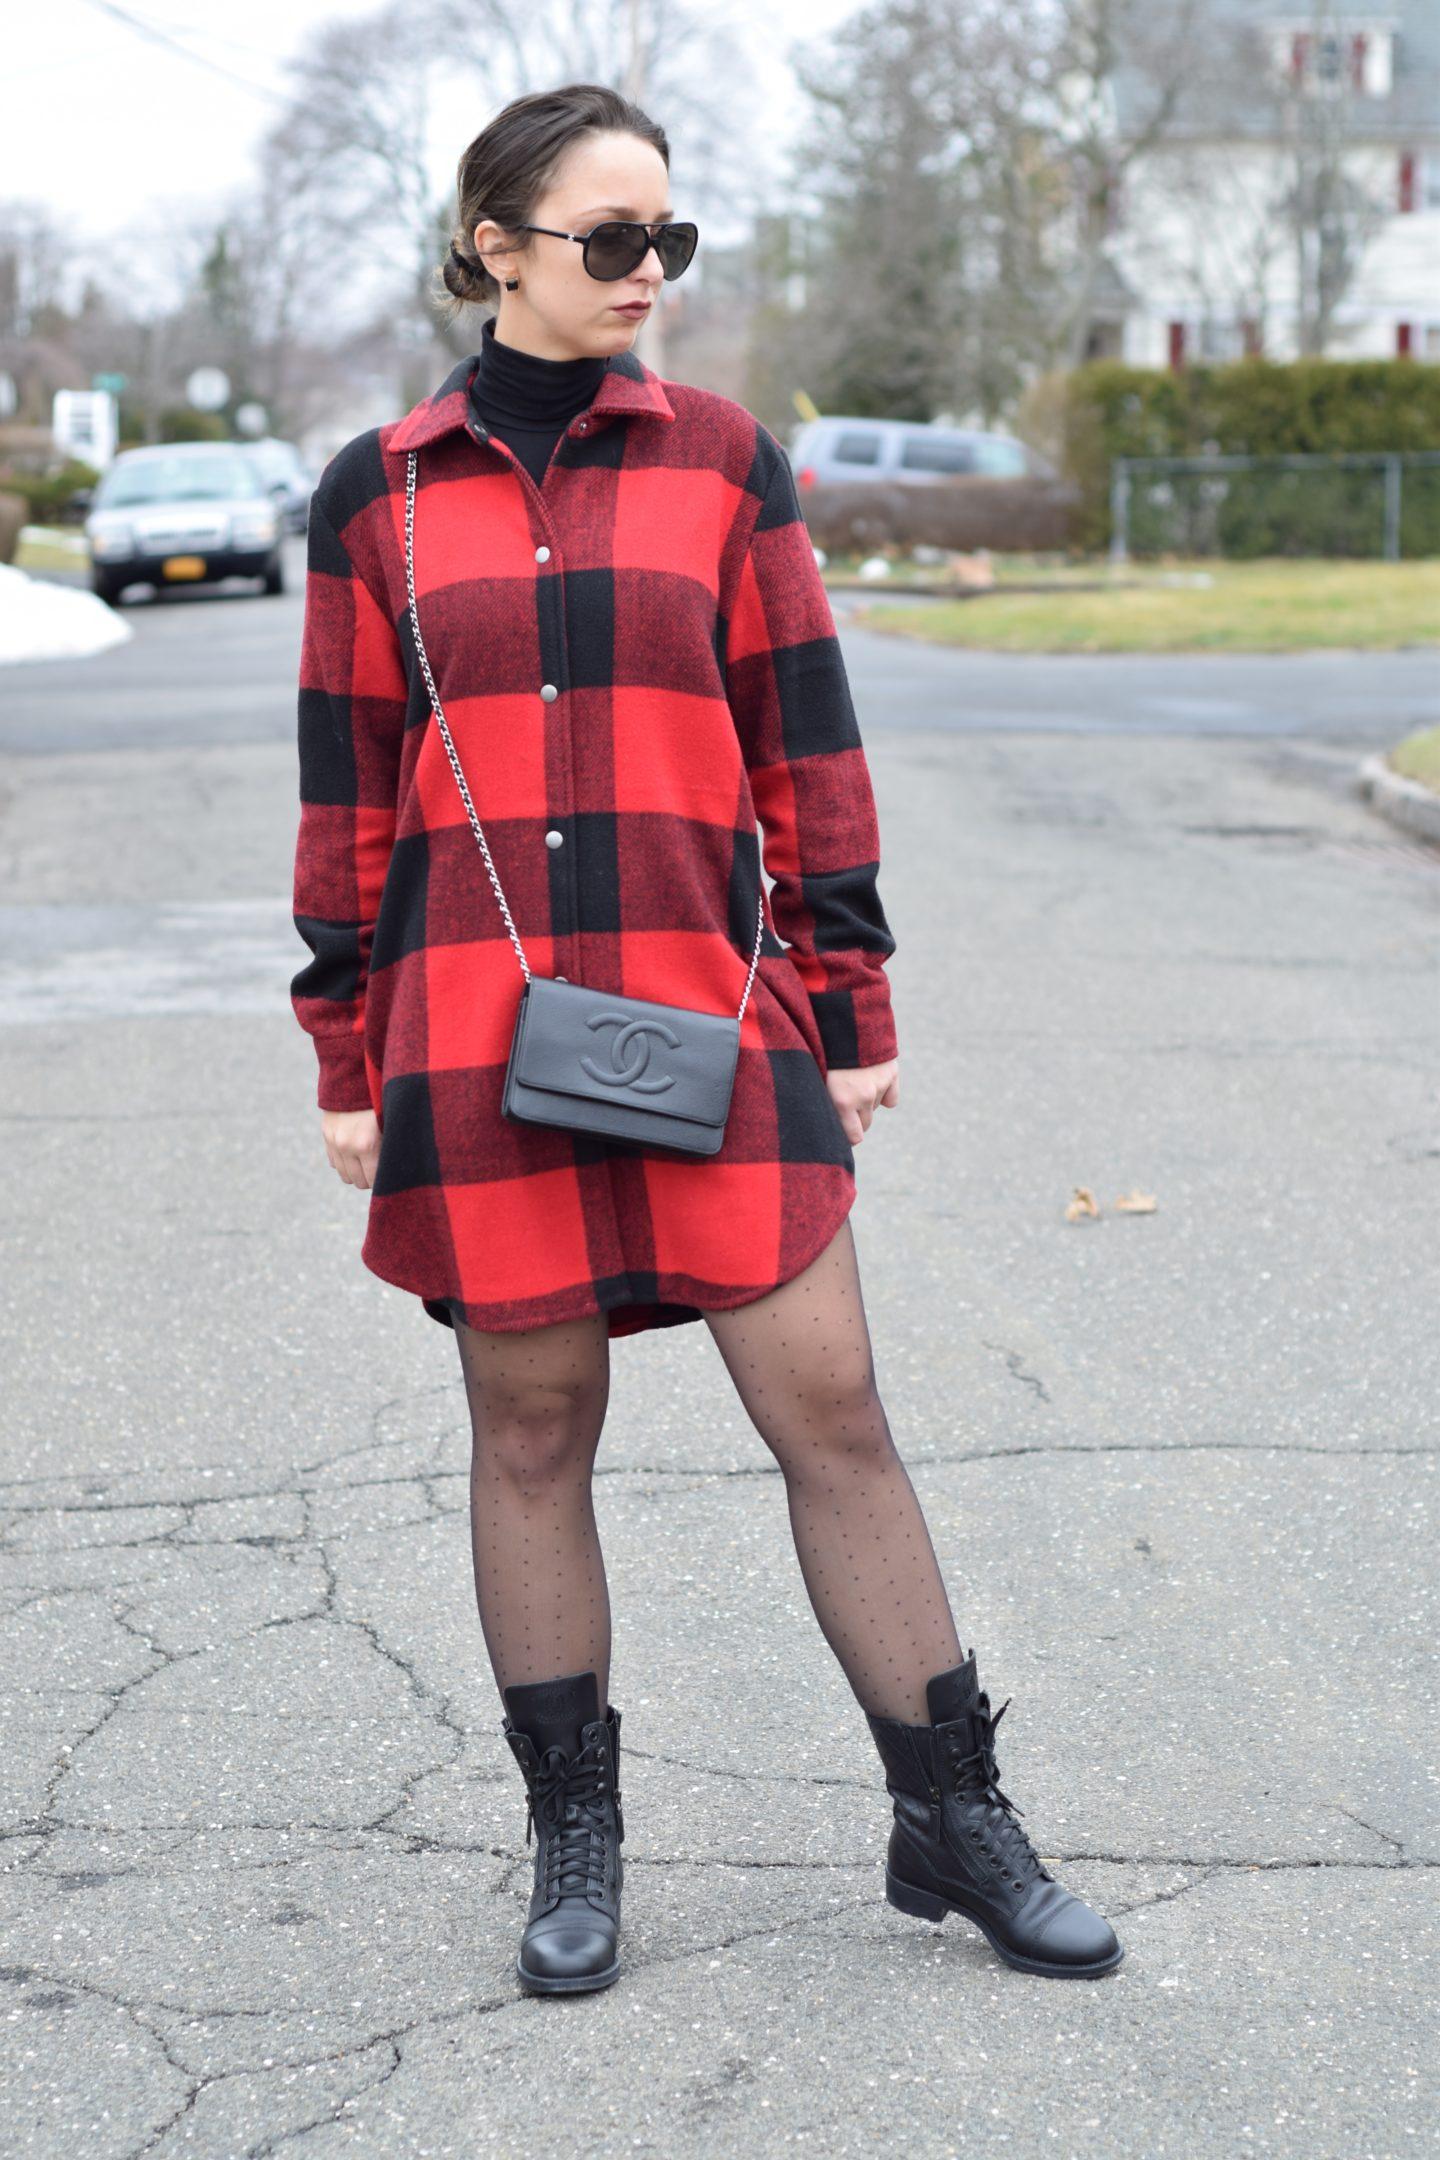 bb dakota-street style-outfit-nyc